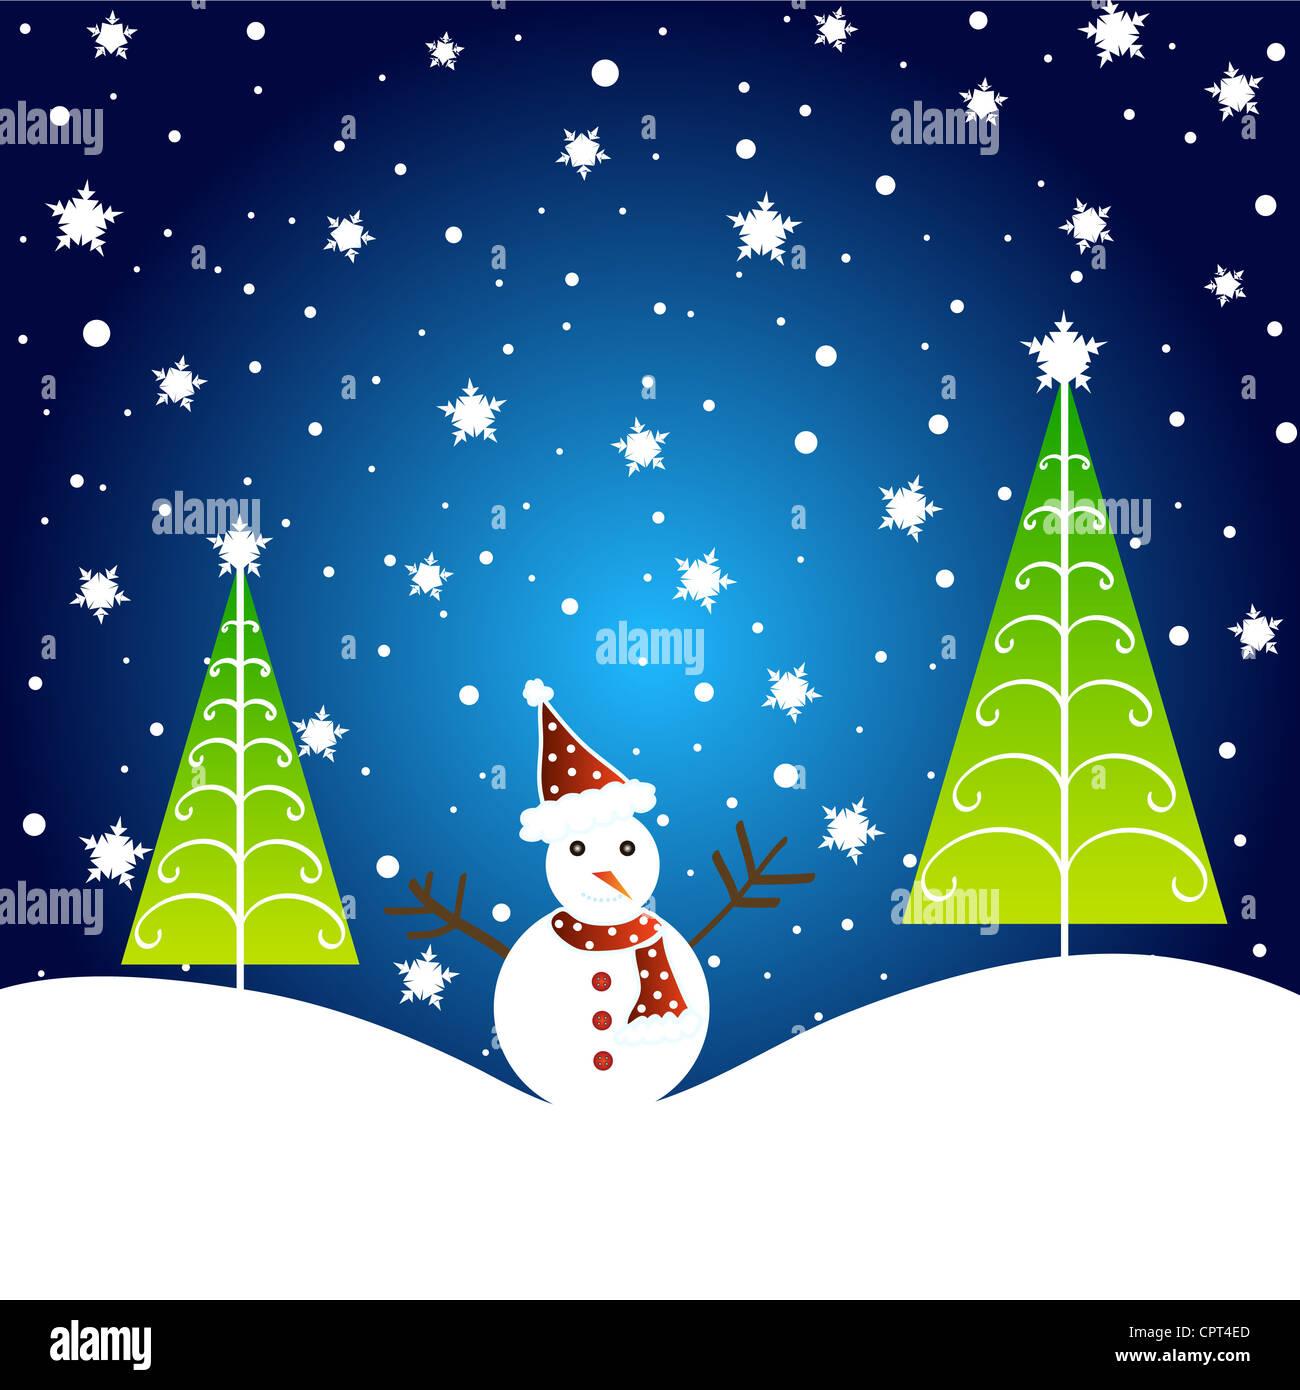 Christmas tree and snowman design Stock Photo